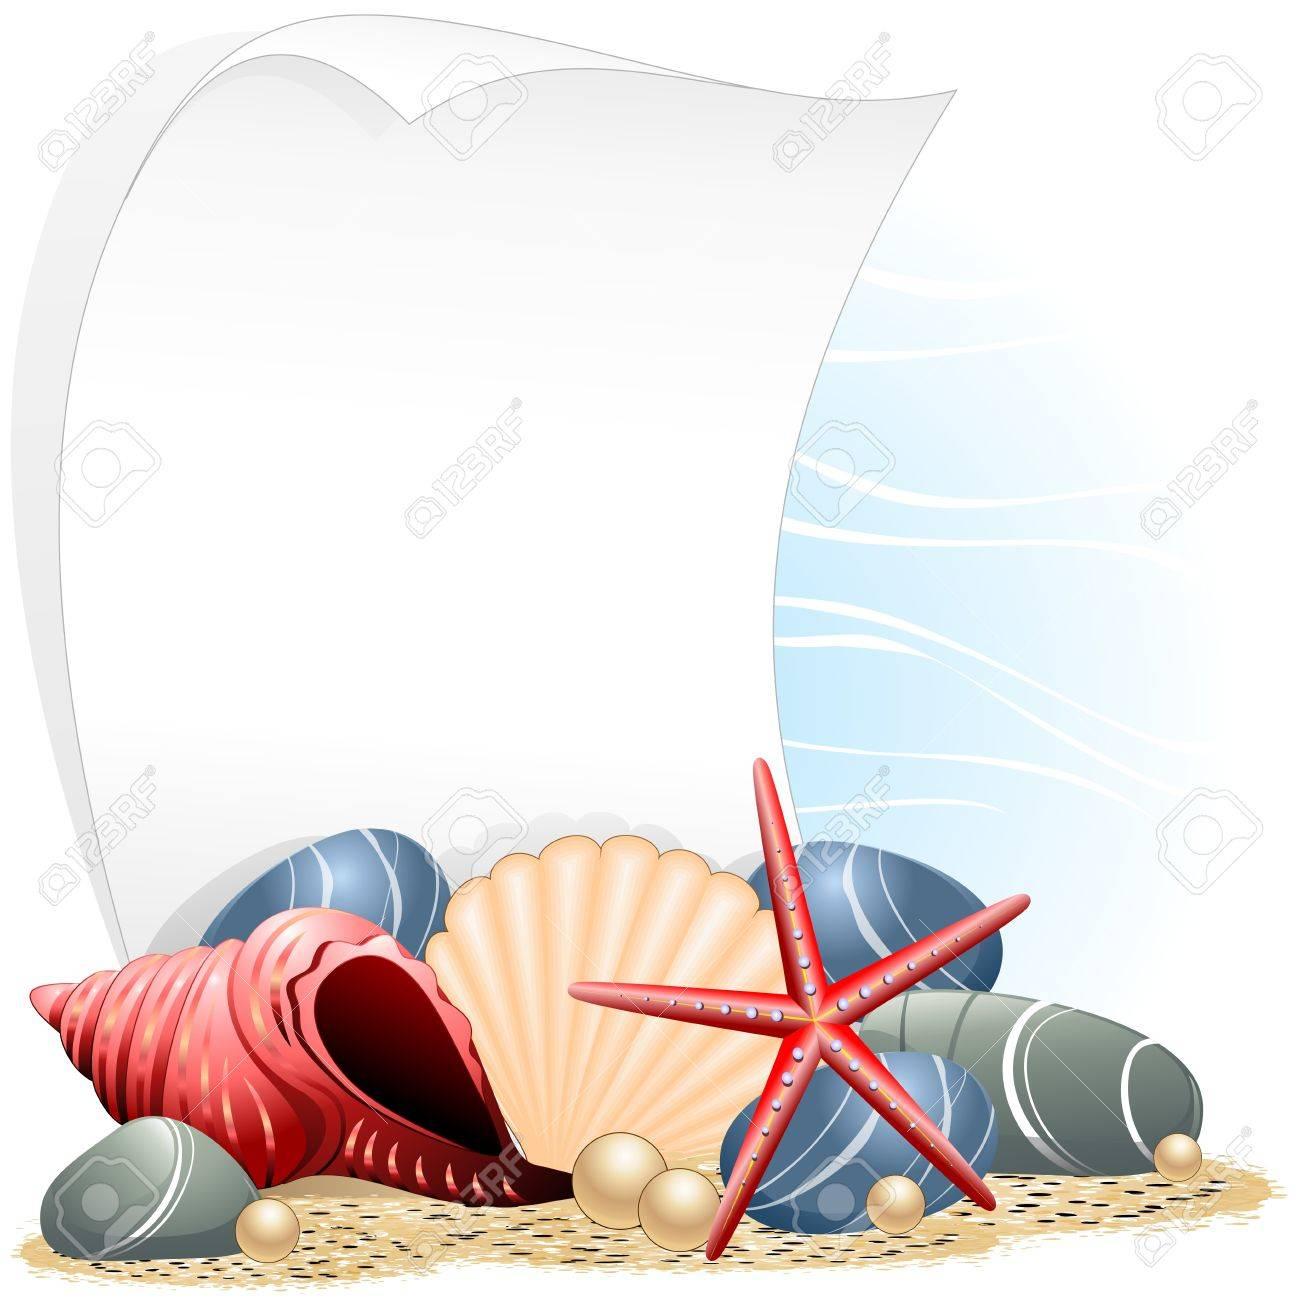 Seashells Starfish and Pearls Ocean Card Stock Vector - 14742617